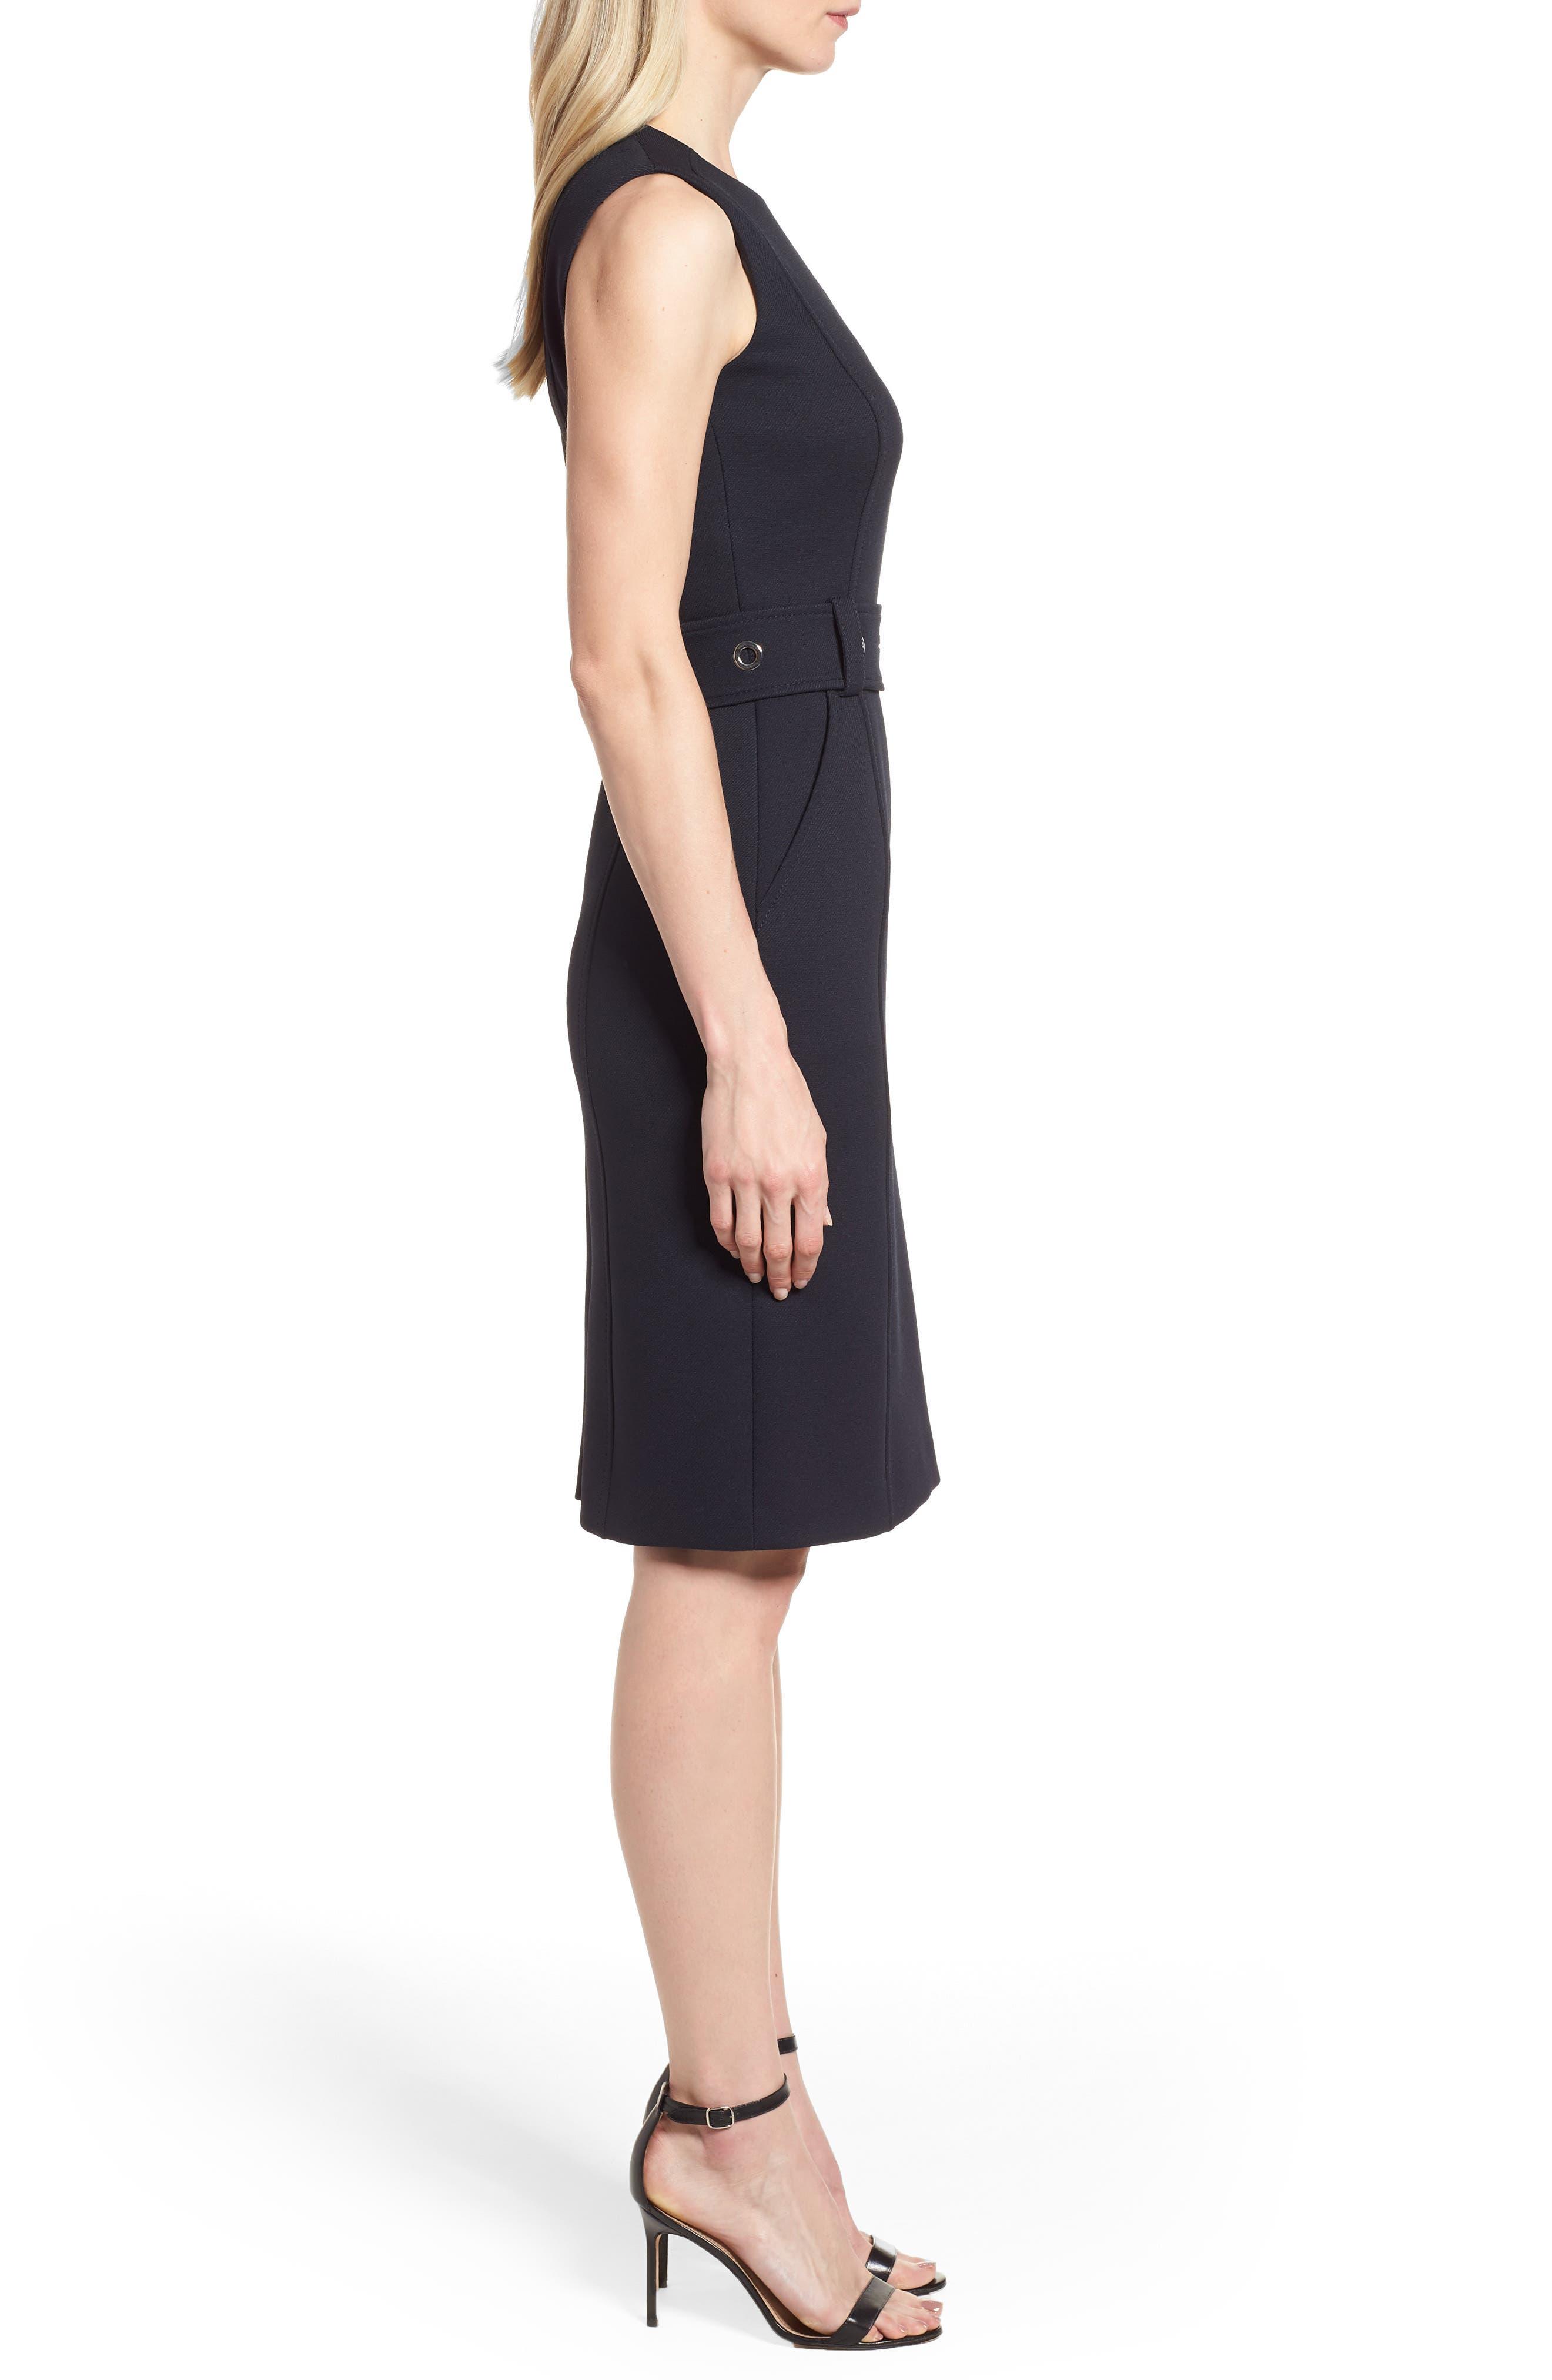 Duleama Belted Sheath Dress,                             Alternate thumbnail 3, color,                             Navy